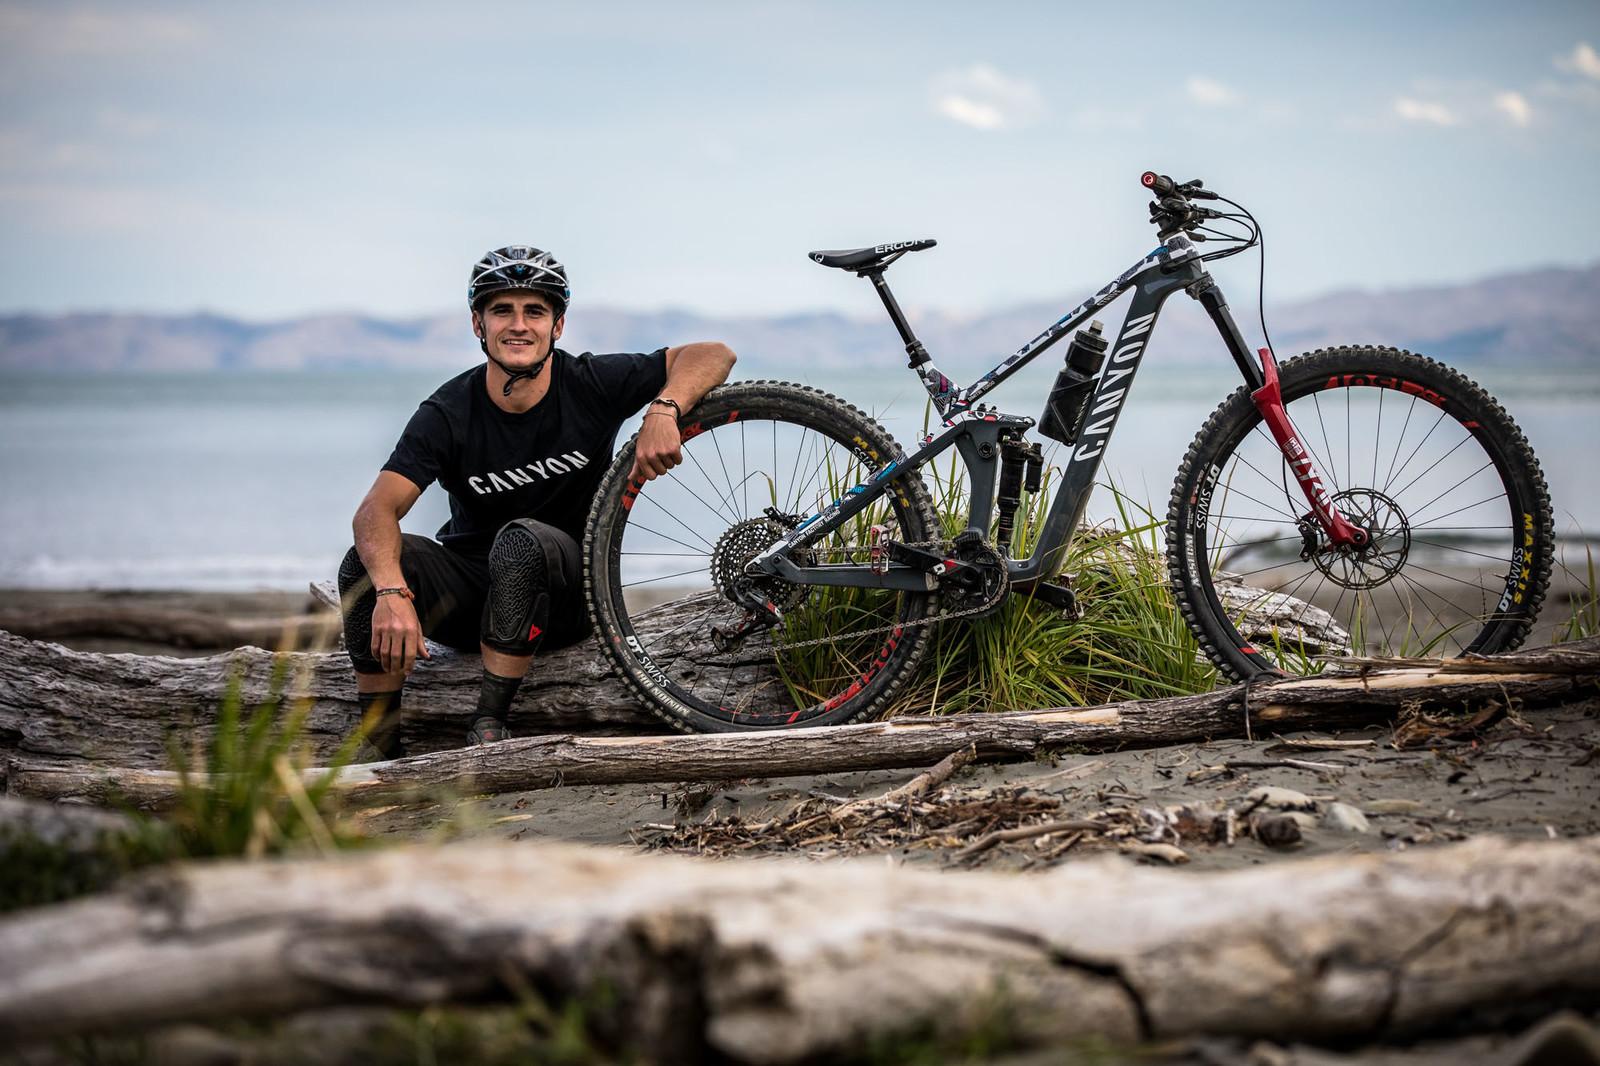 NZEnduro19 BB 898A9150 - 2019 NZ Enduro Day 1 Photo Gallery - Mountain Biking Pictures - Vital MTB